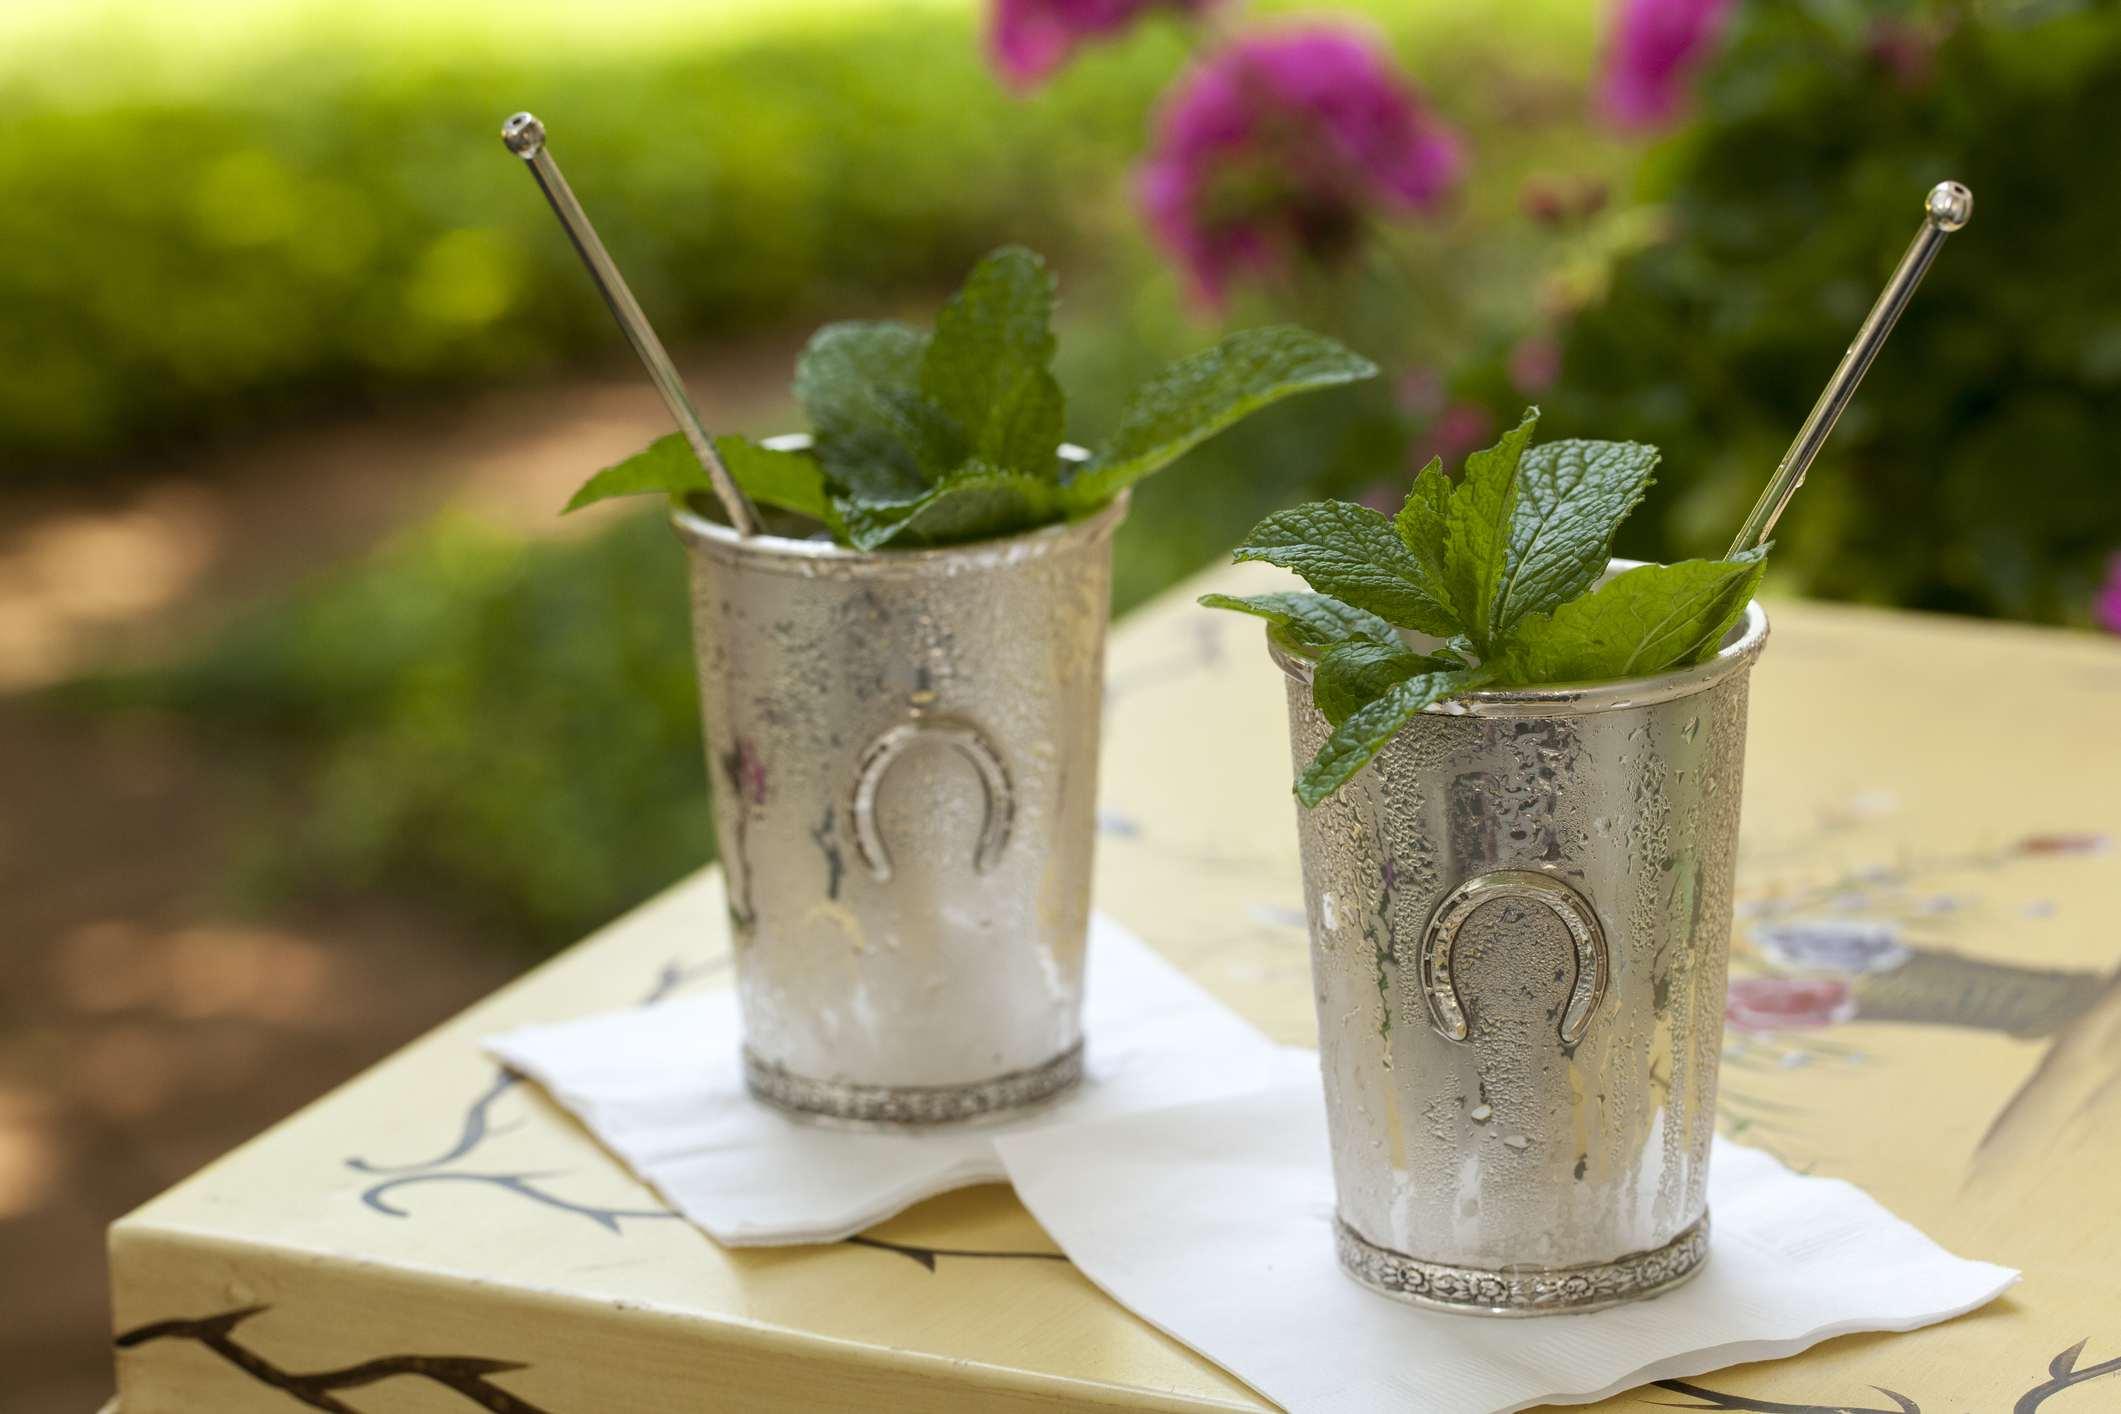 Mint julep in Kentucky Derby style cup